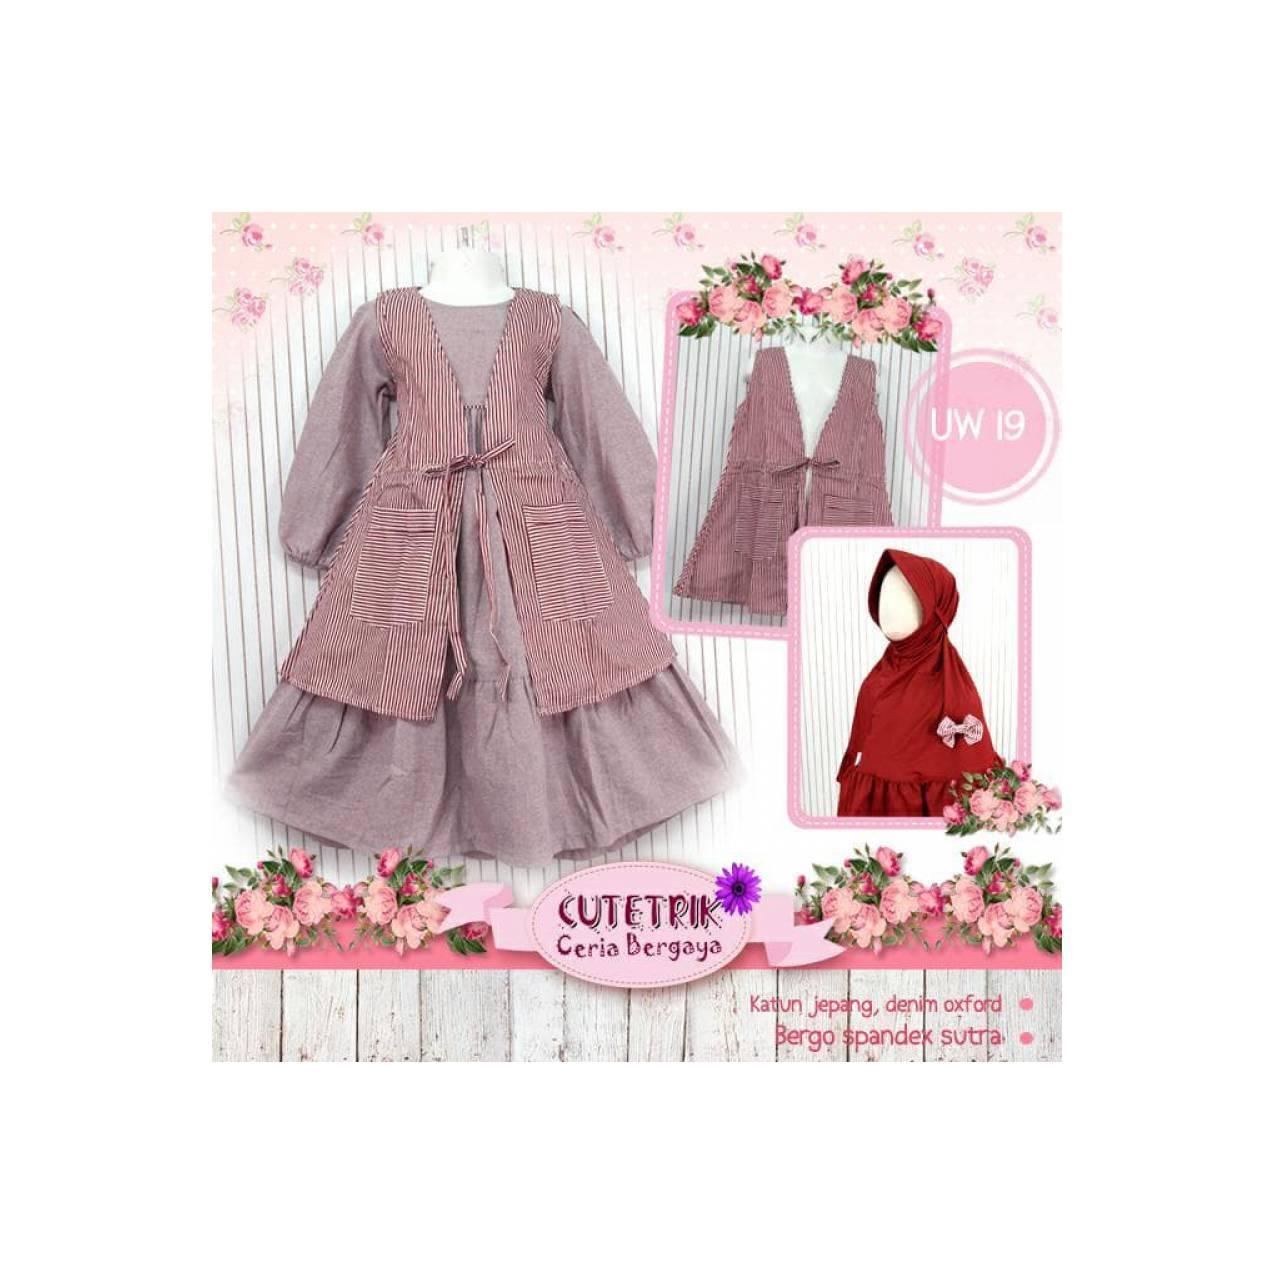 Gamis Anak /Dress /Baju Muslim Anak 3-7thn Lucu Murah Cutetrik UW19